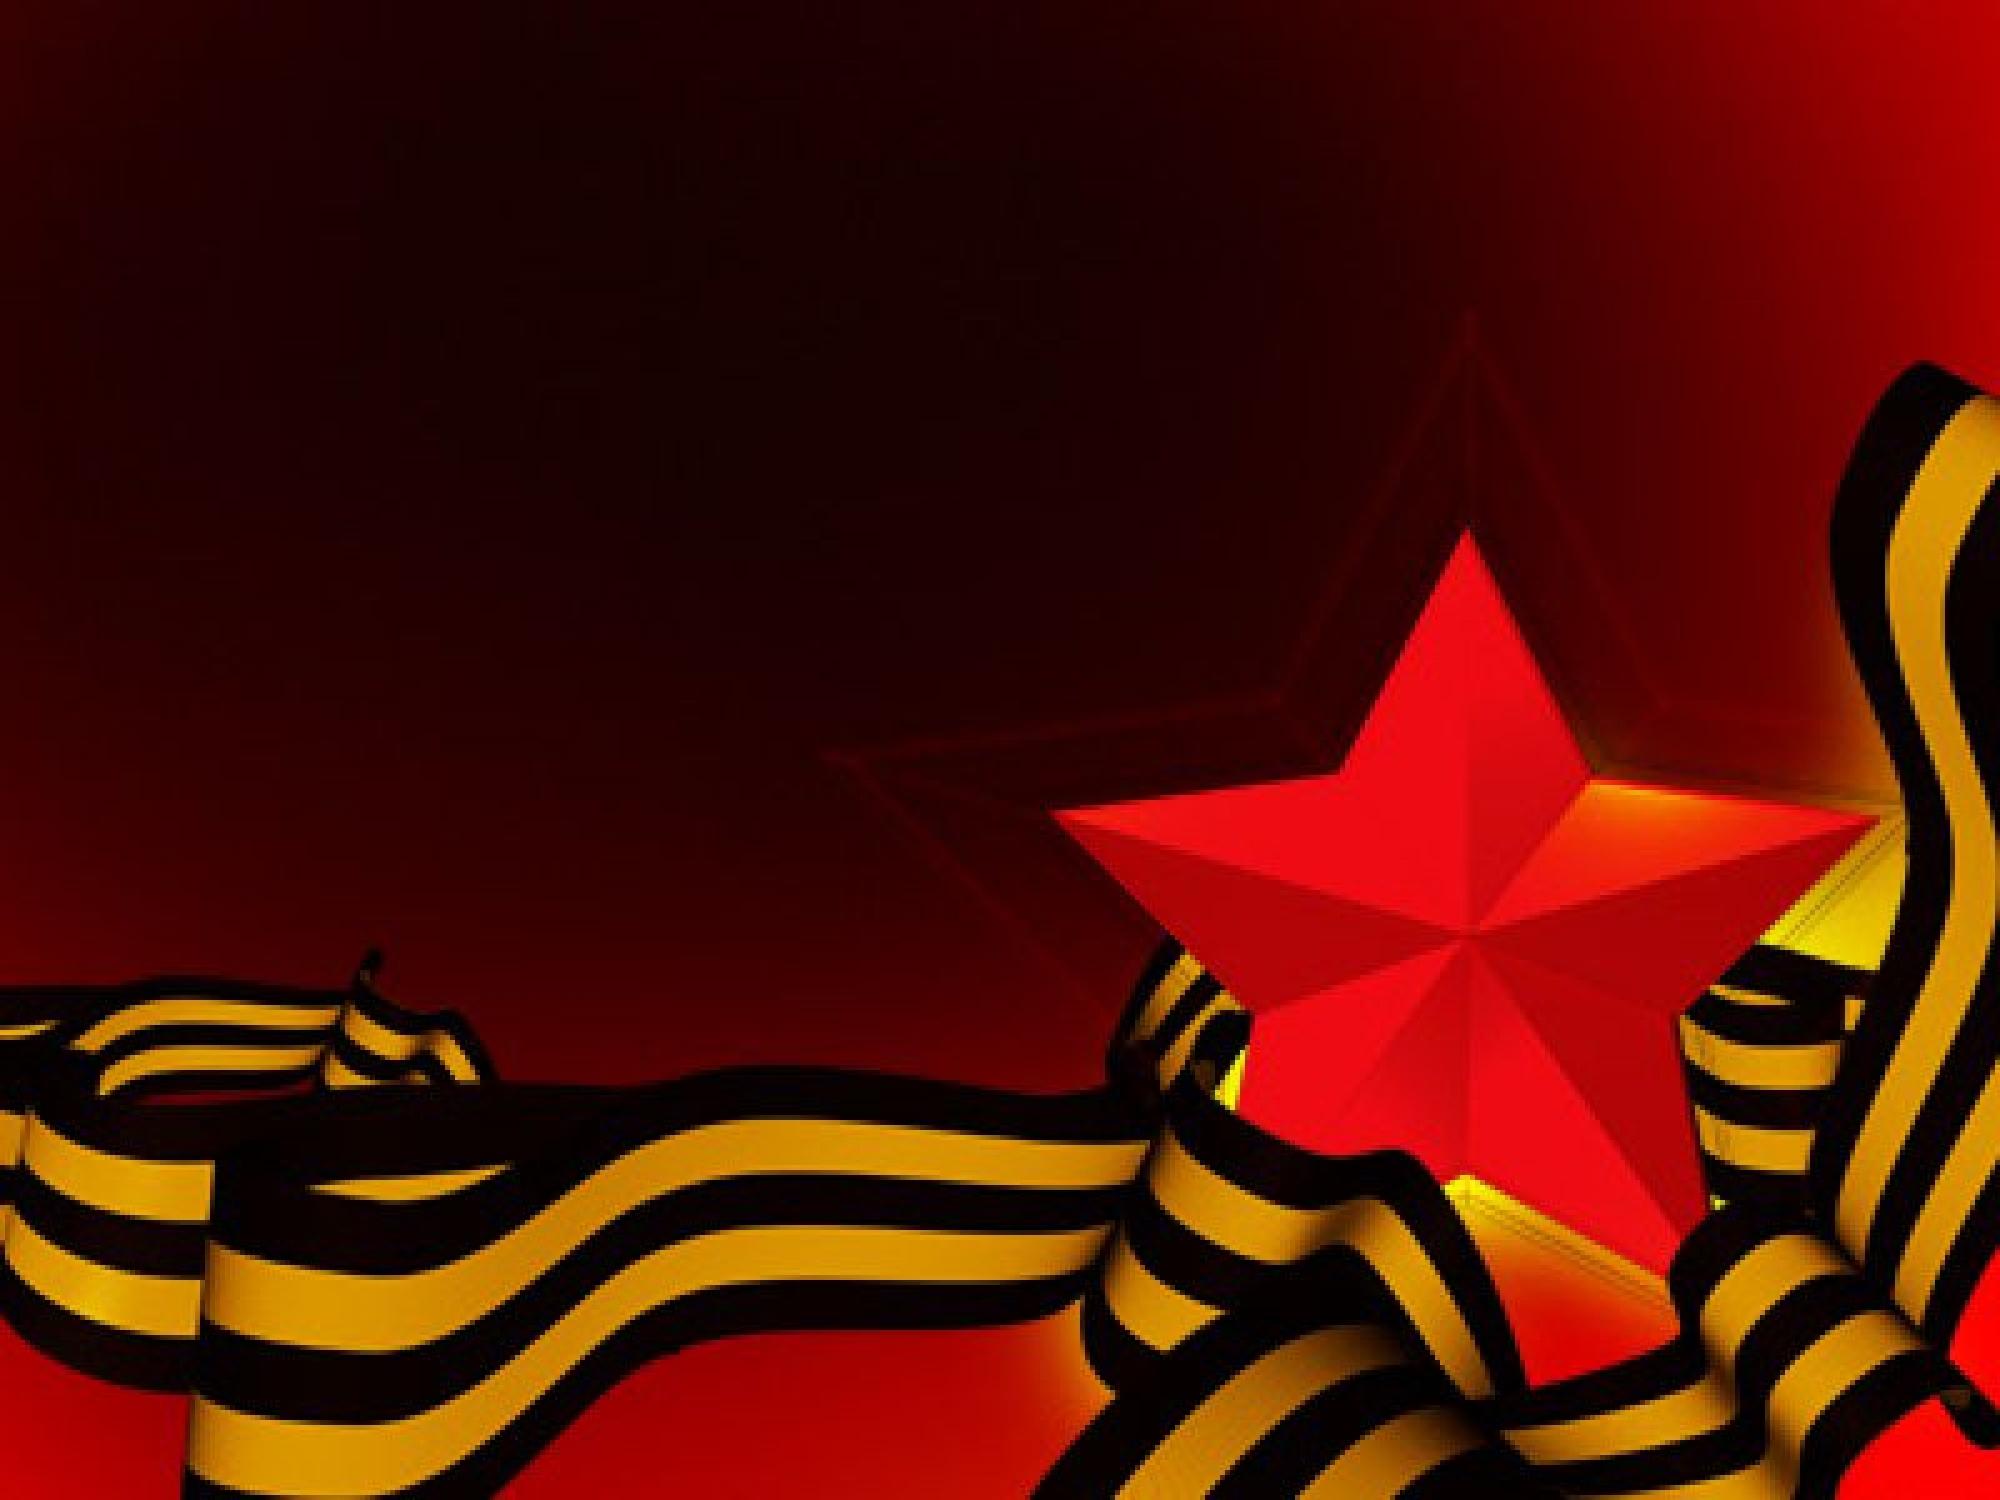 Сценарий акция звезда победы